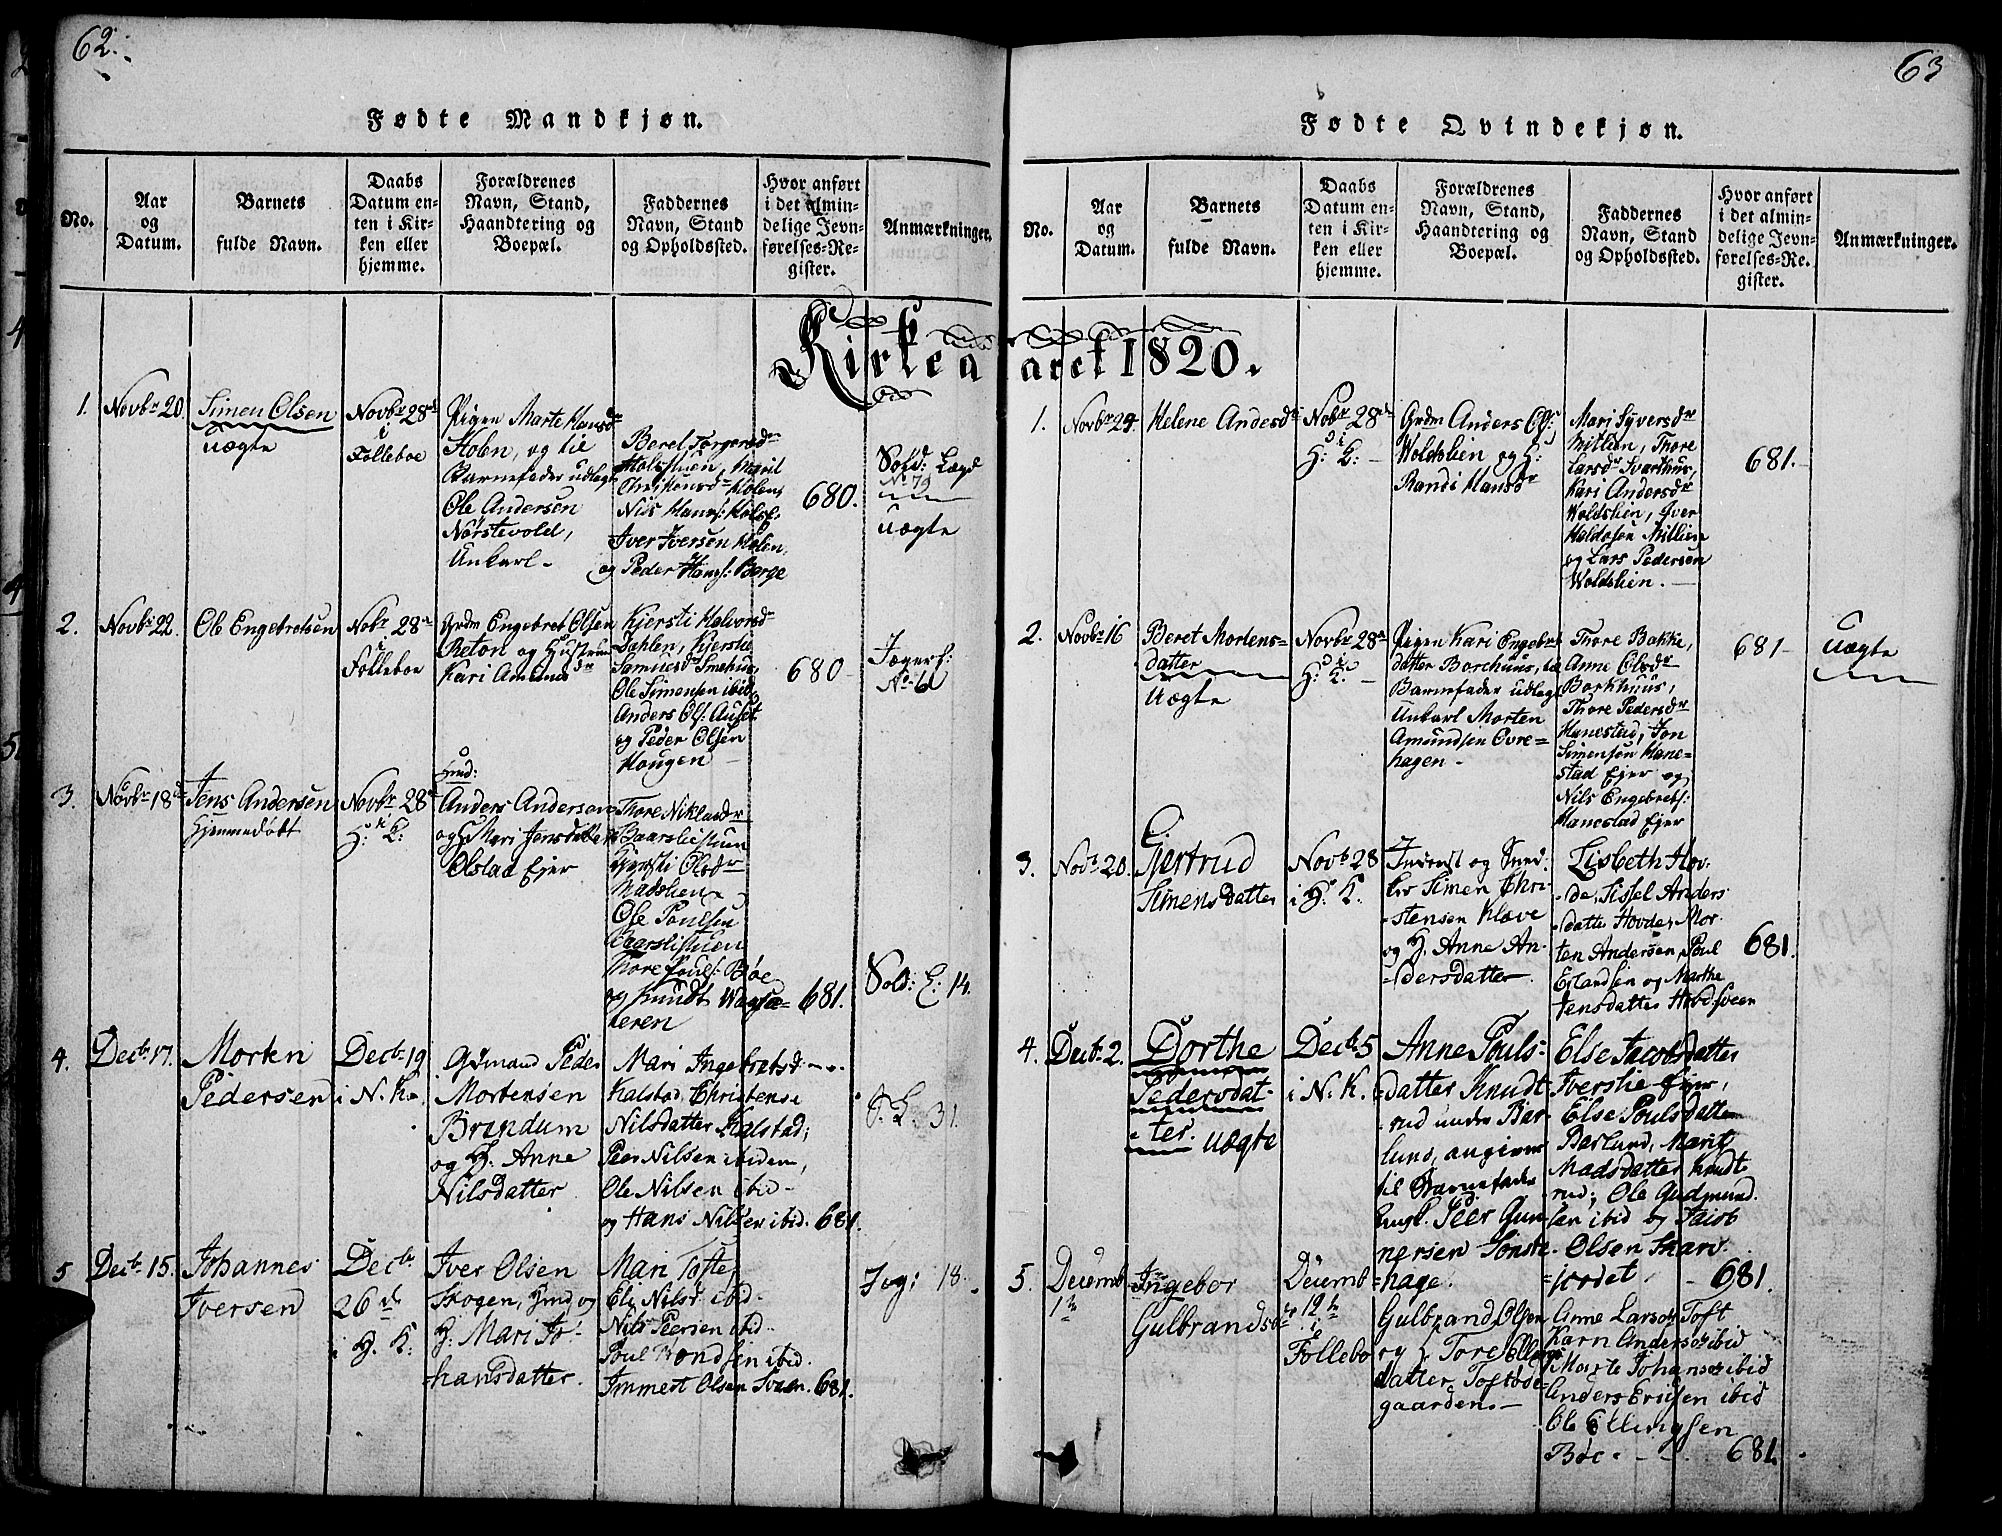 SAH, Gausdal prestekontor, Ministerialbok nr. 5, 1817-1829, s. 62-63